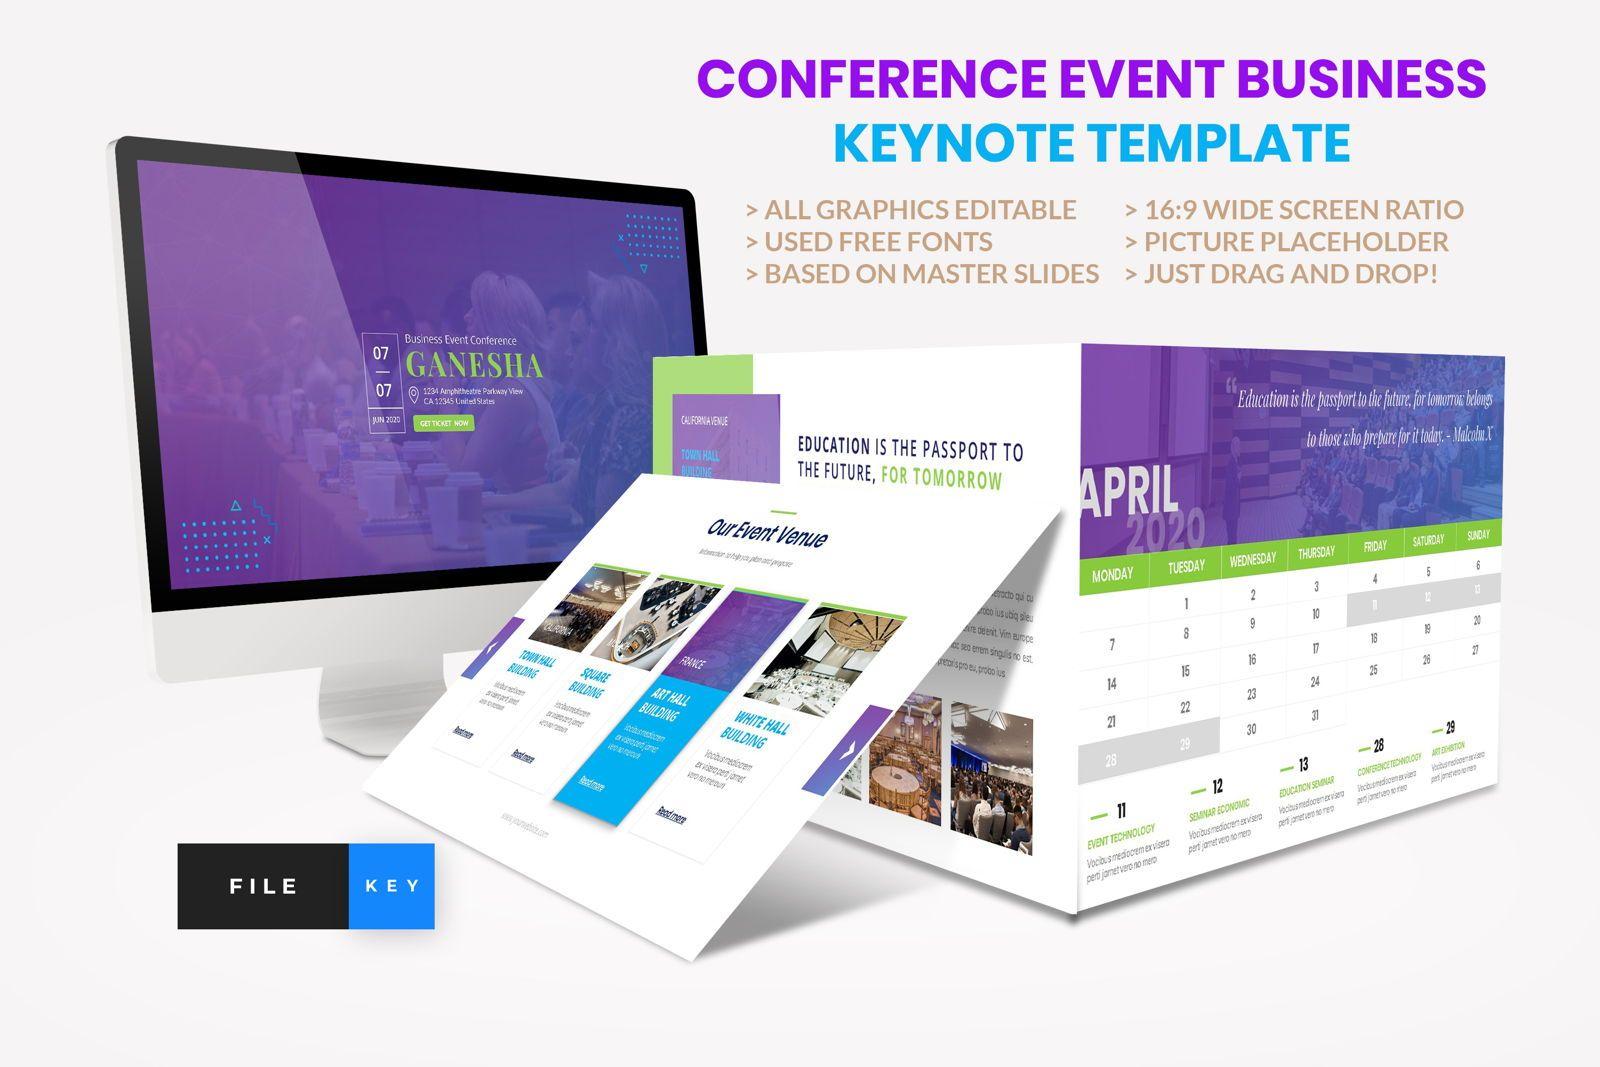 Conference - Event Business Keynote Template, 08586, Presentation Templates — PoweredTemplate.com